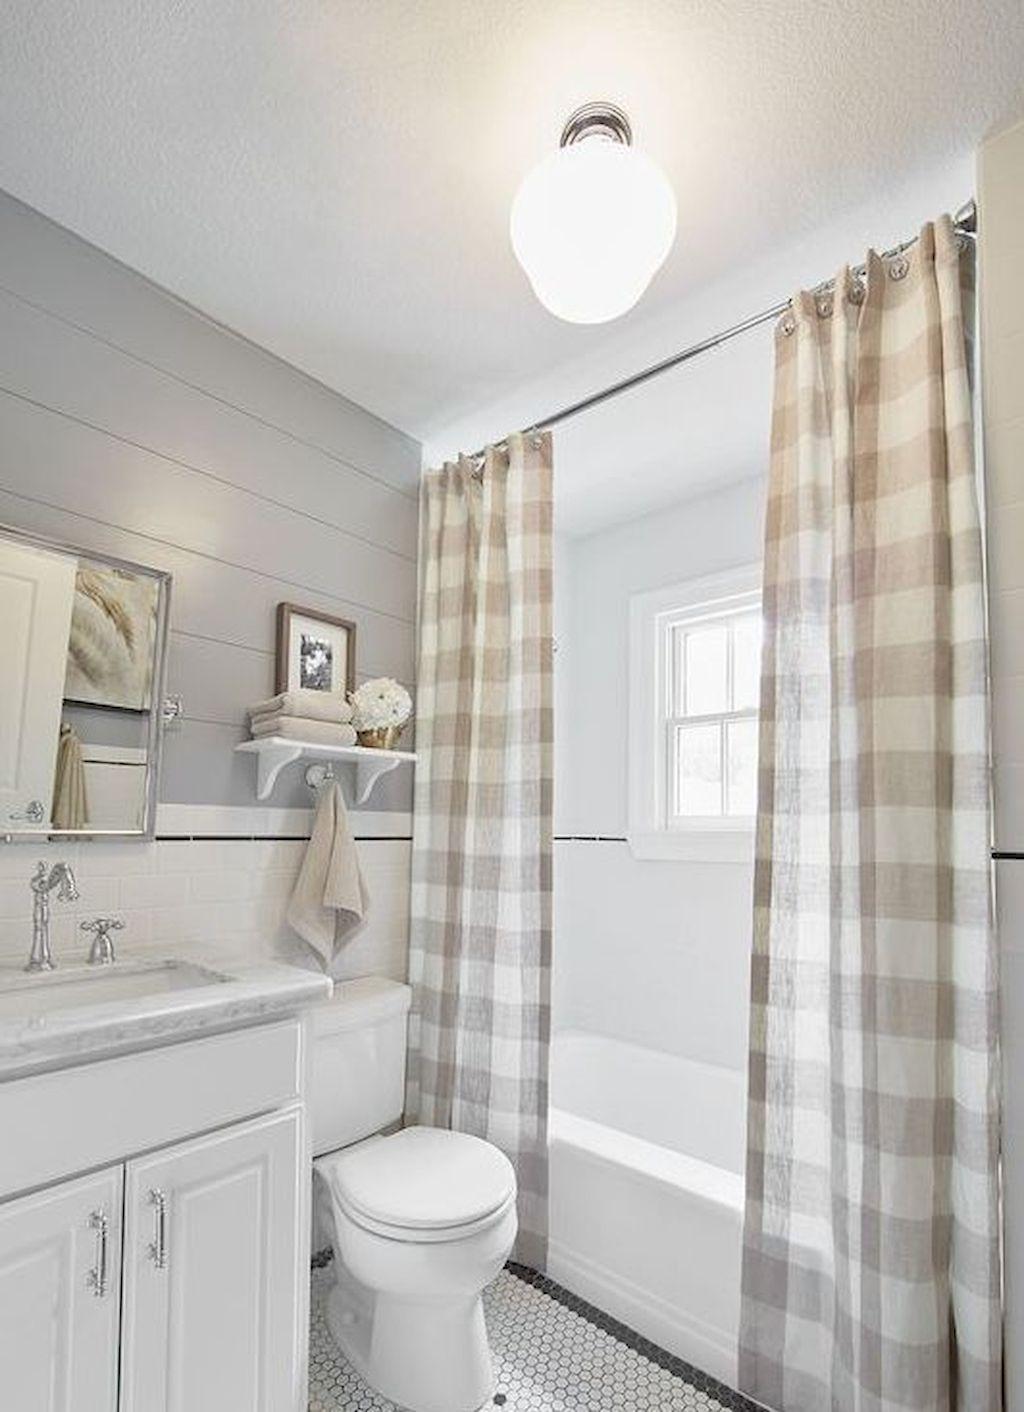 Awesome 45 Farmhouse Rustic Bathroom Decor Ideas on A Budget https ...